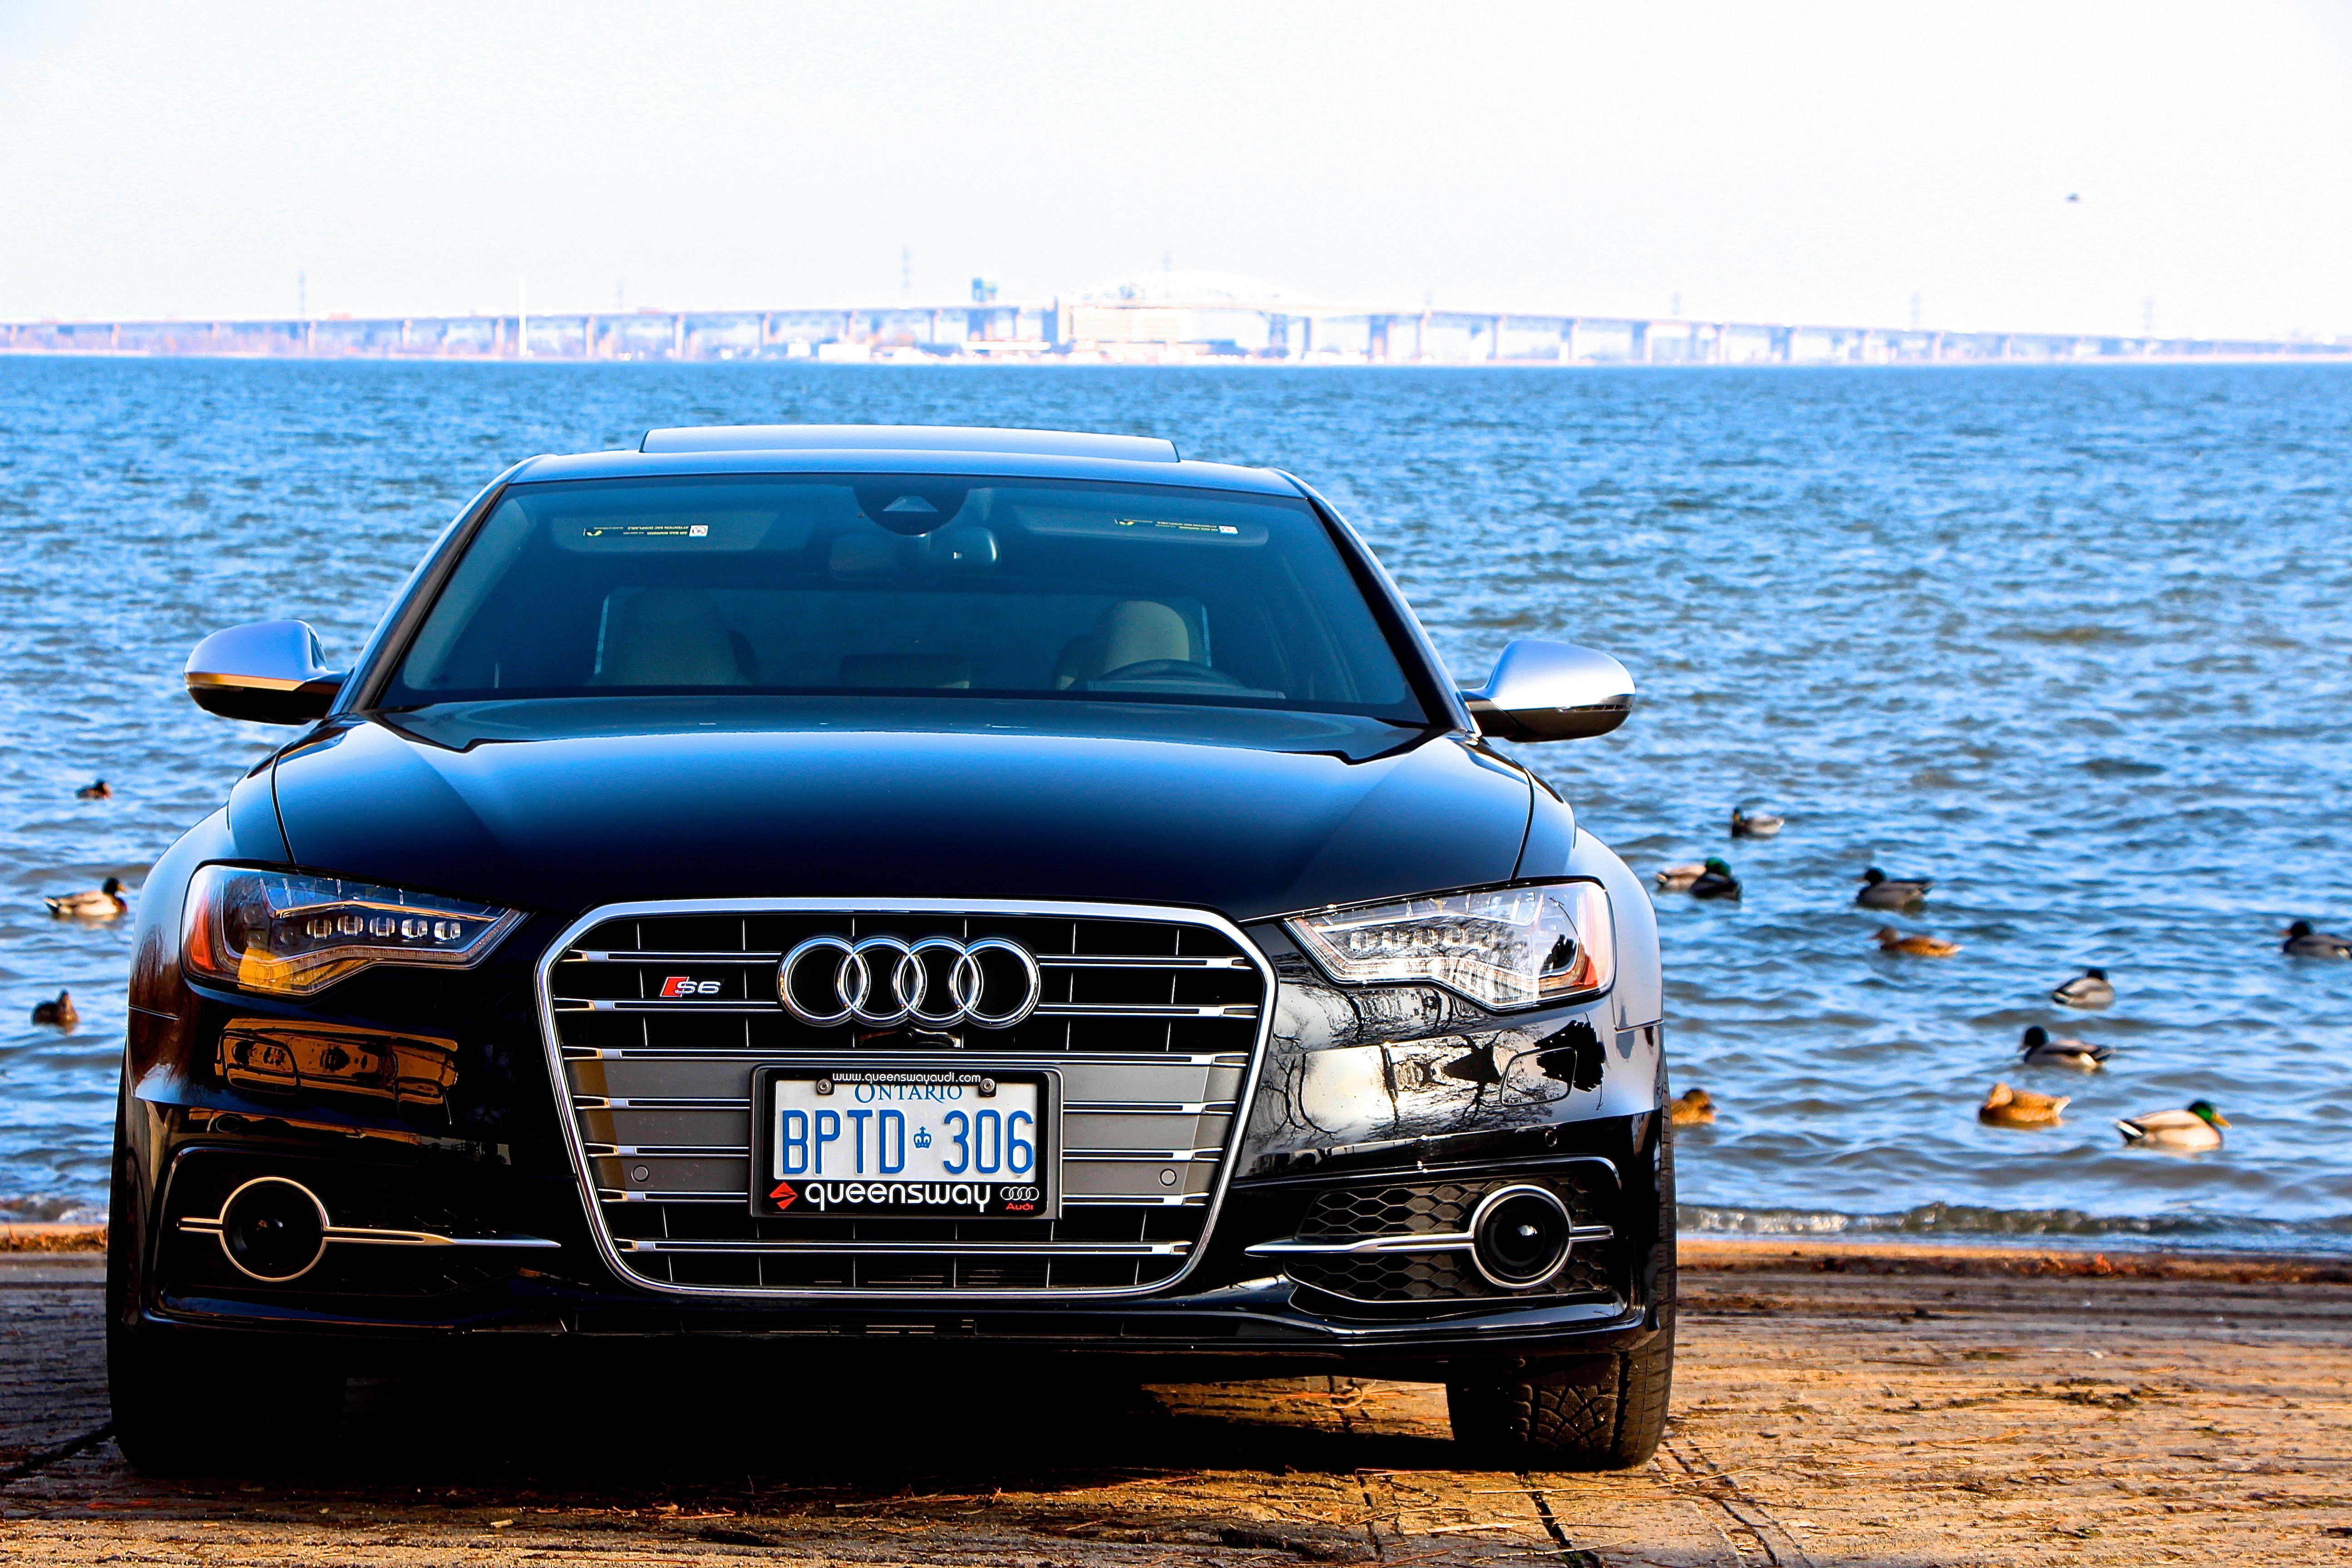 2014 Audi S6 Image 11